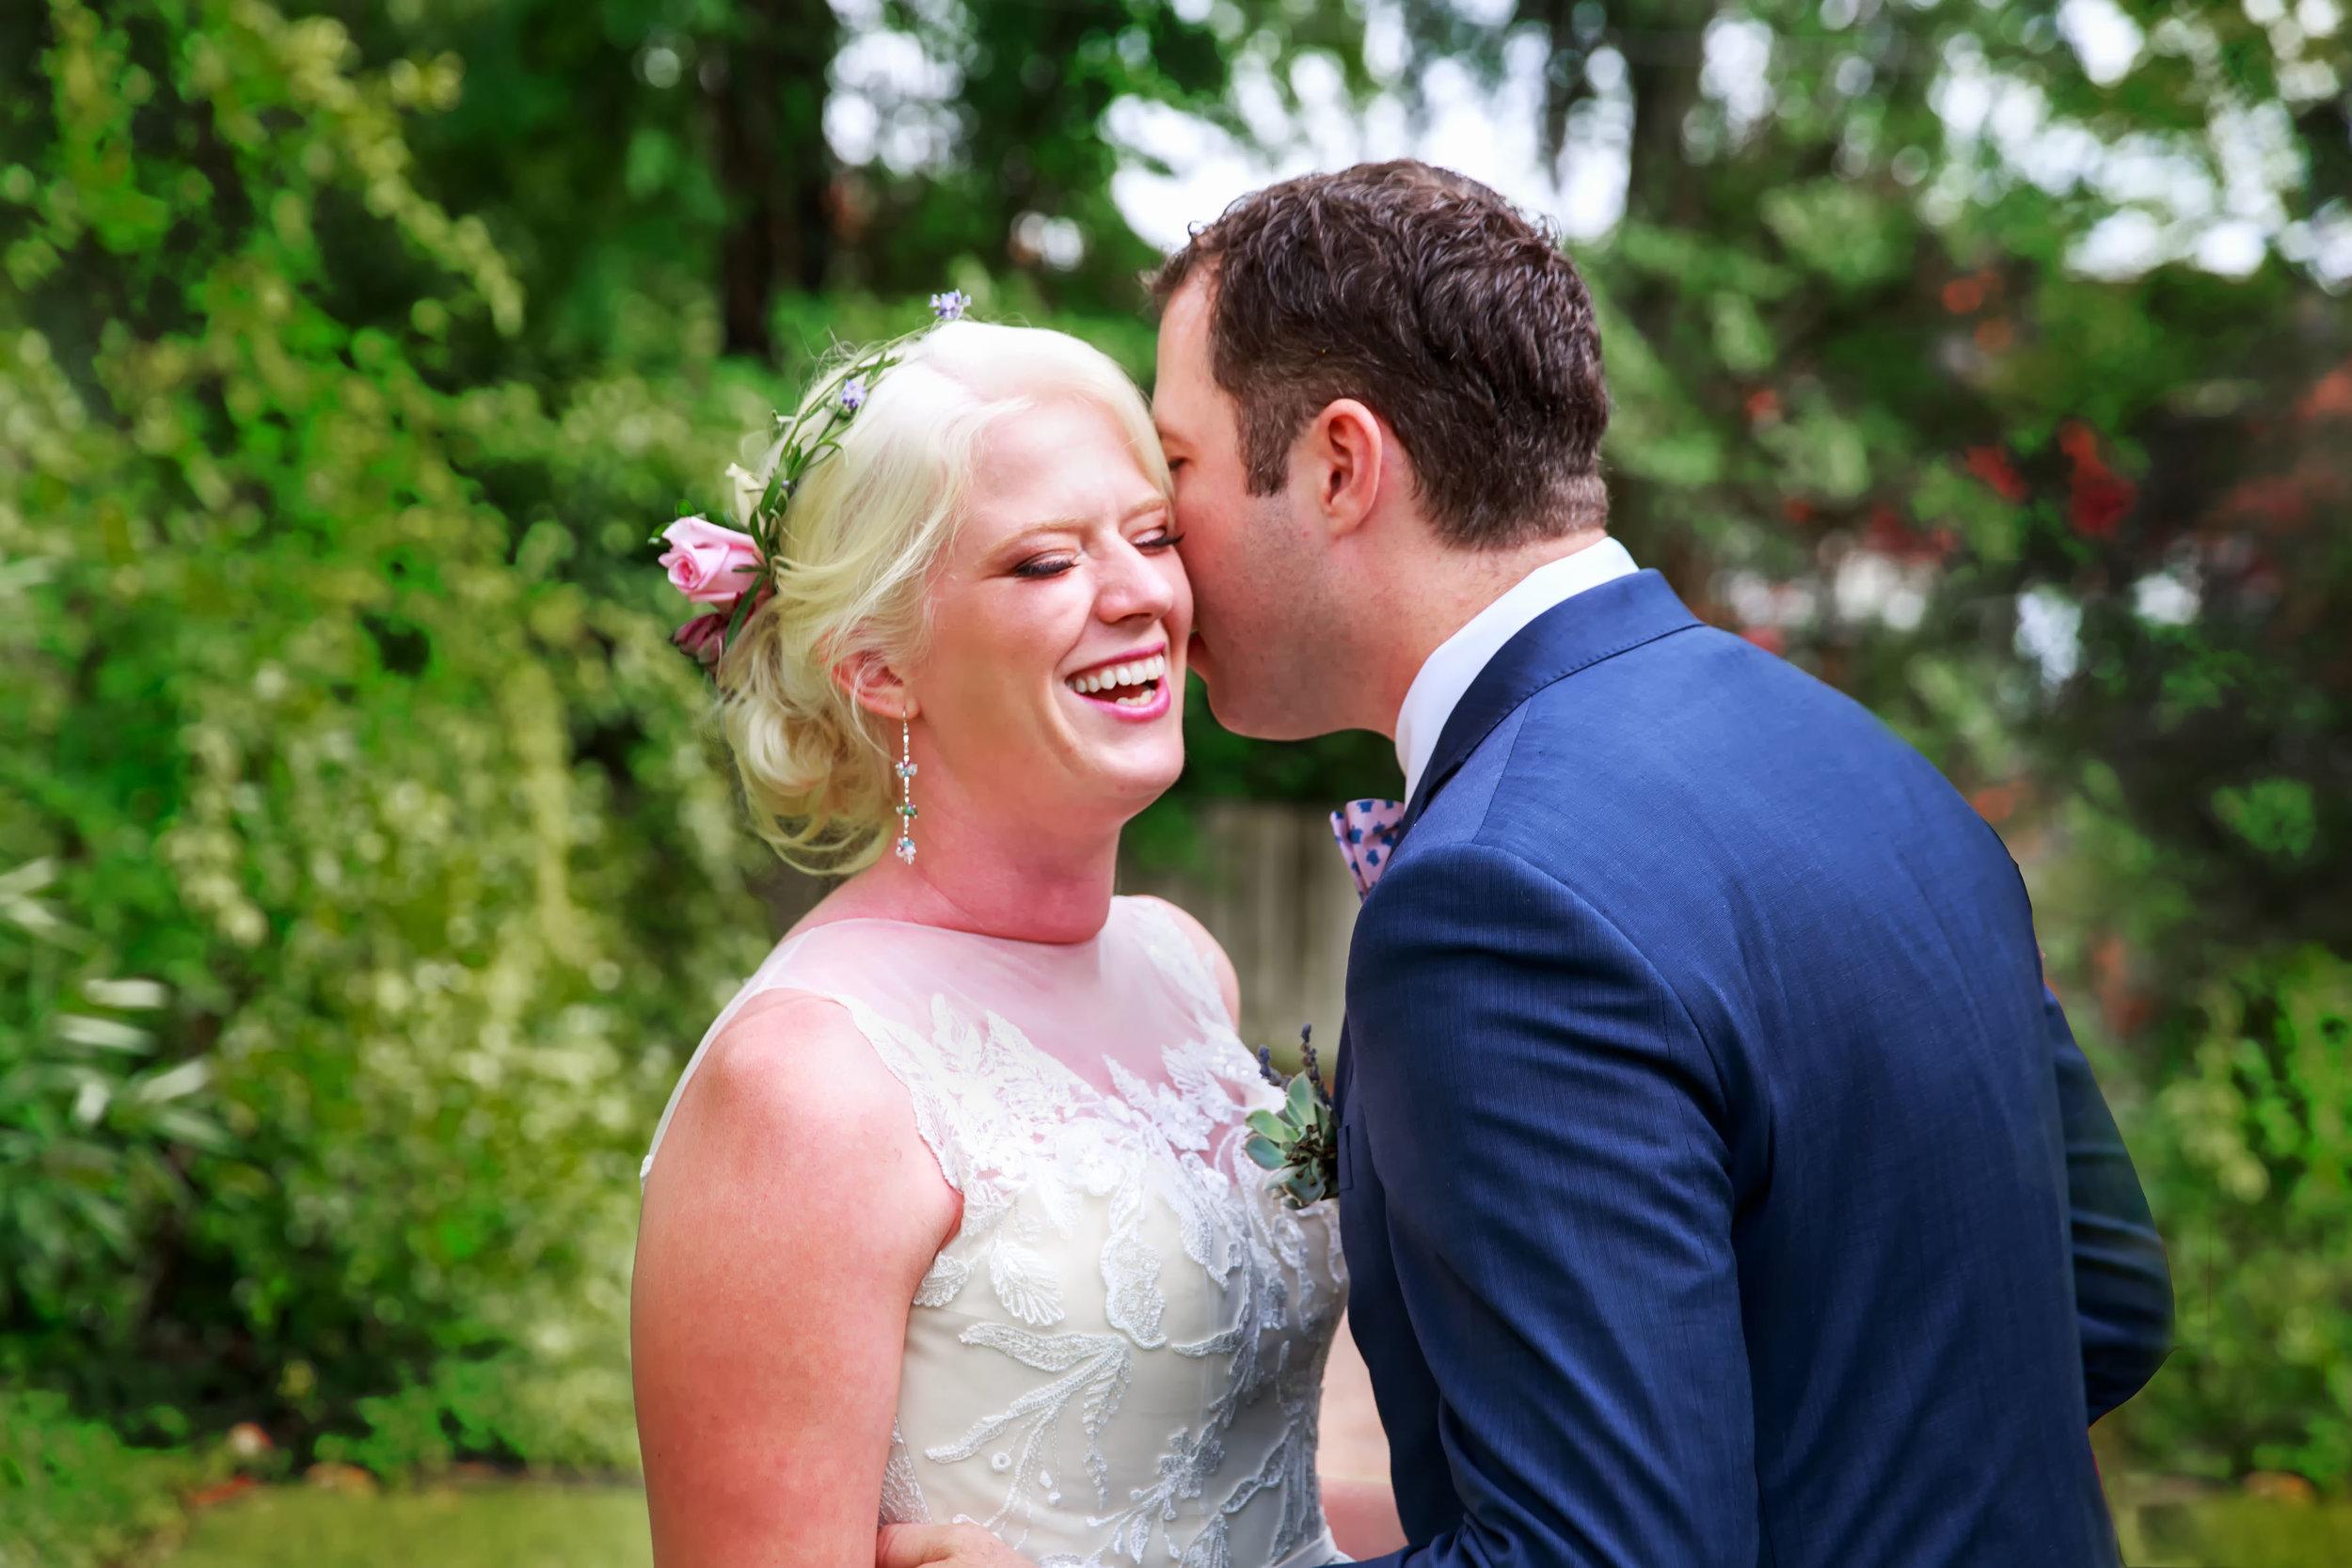 128-South-Wedding-Tiffany-Abruzzo-Photography-Bride-&-Groom-20.jpg